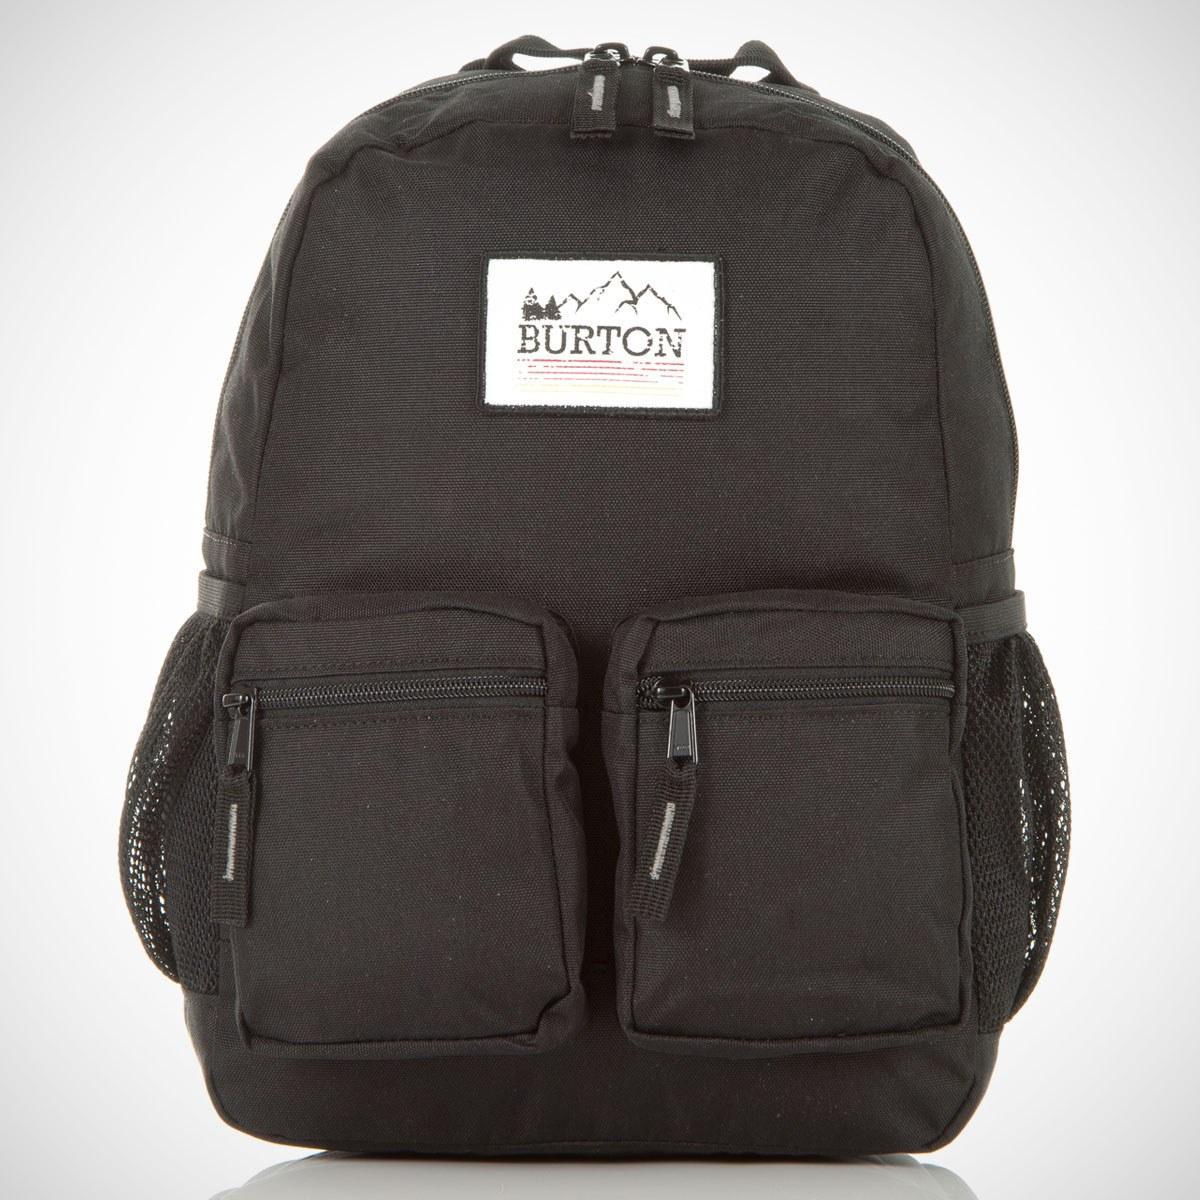 Batoh do školy BURTON YOUTH GROMLET PACK 110551-002 TRUE BLACK ... d9165decf5